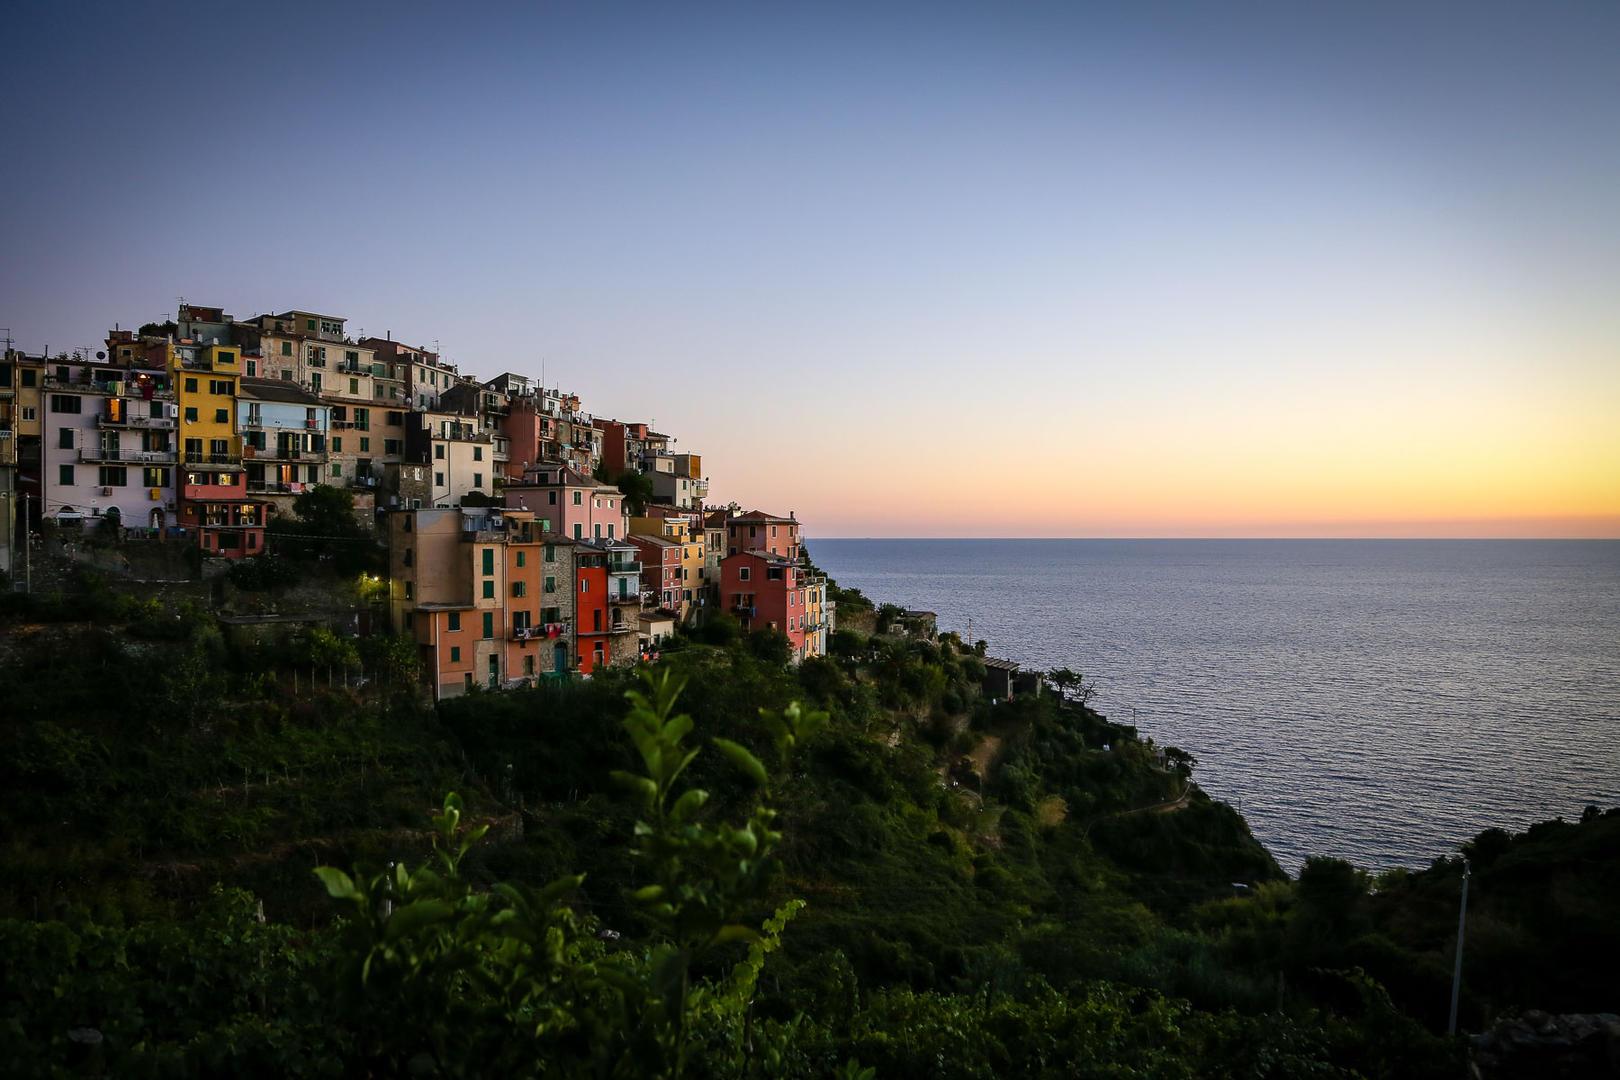 fletkefoto travel landscape photography